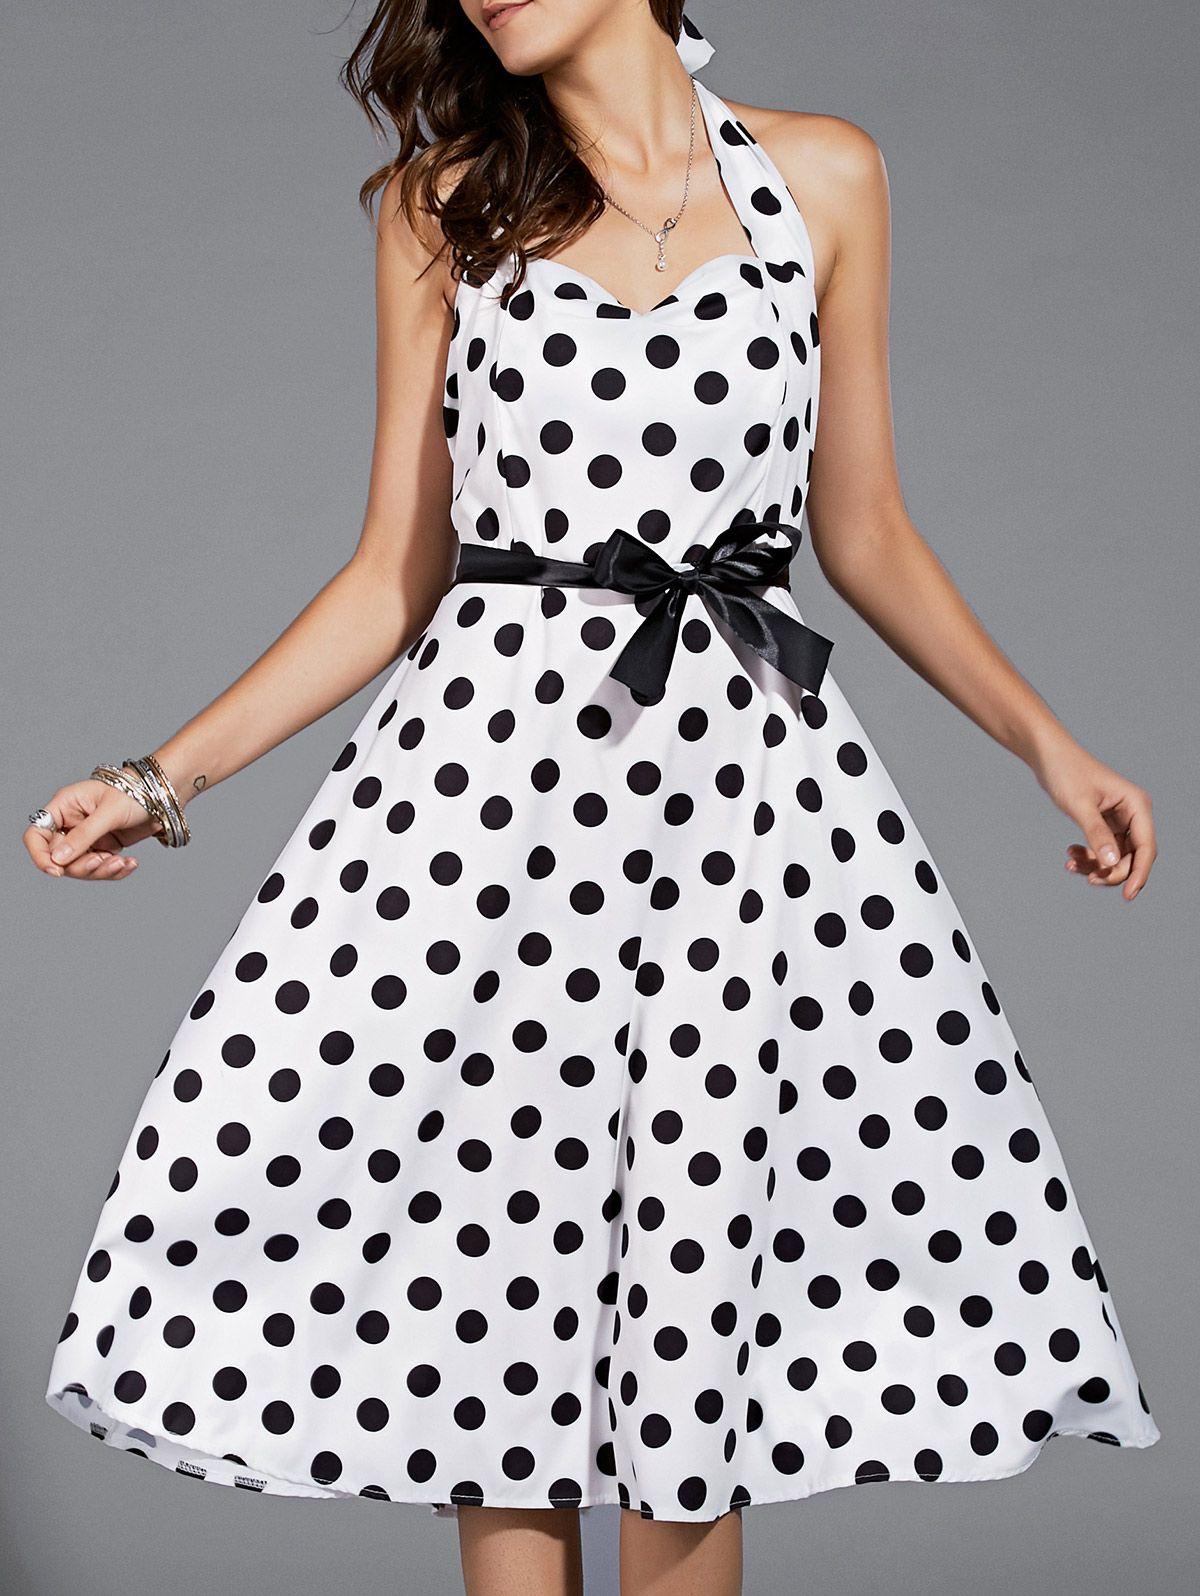 Vintage Style Halter Black and White Polka Dot Midi Dress For Women #Black_and_White #Polka_Dots #Dress #Fashion